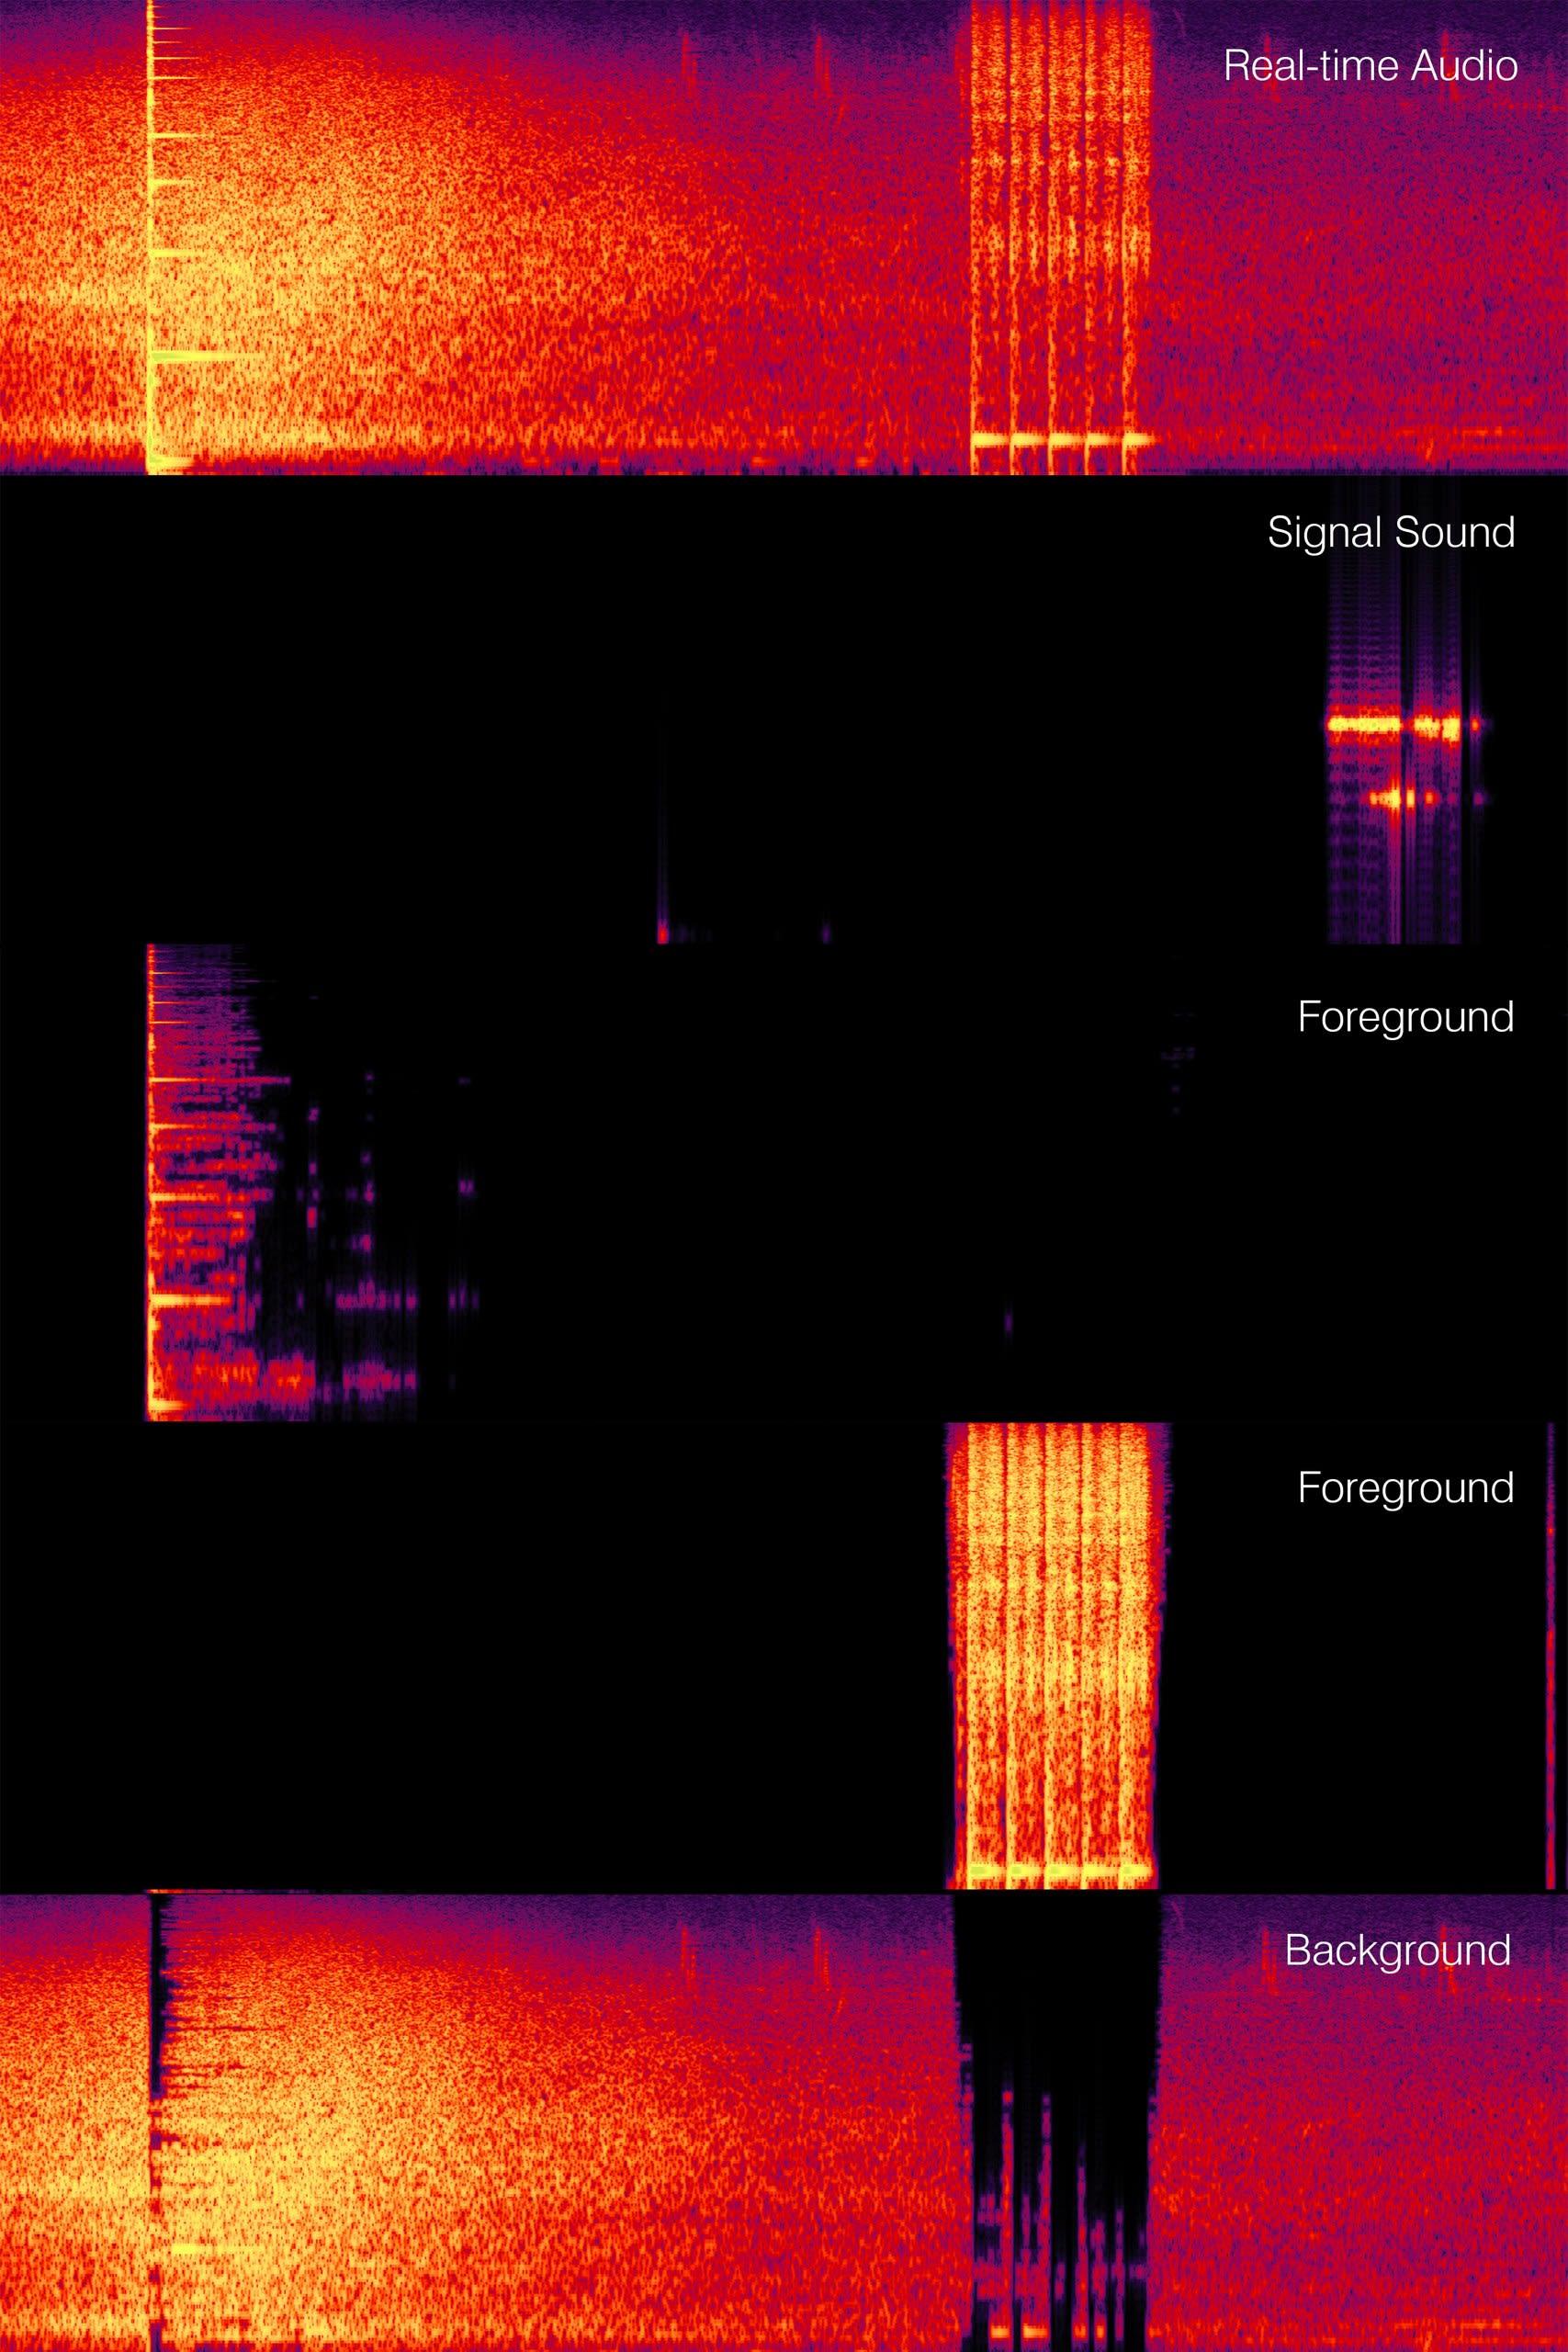 Sound Separation